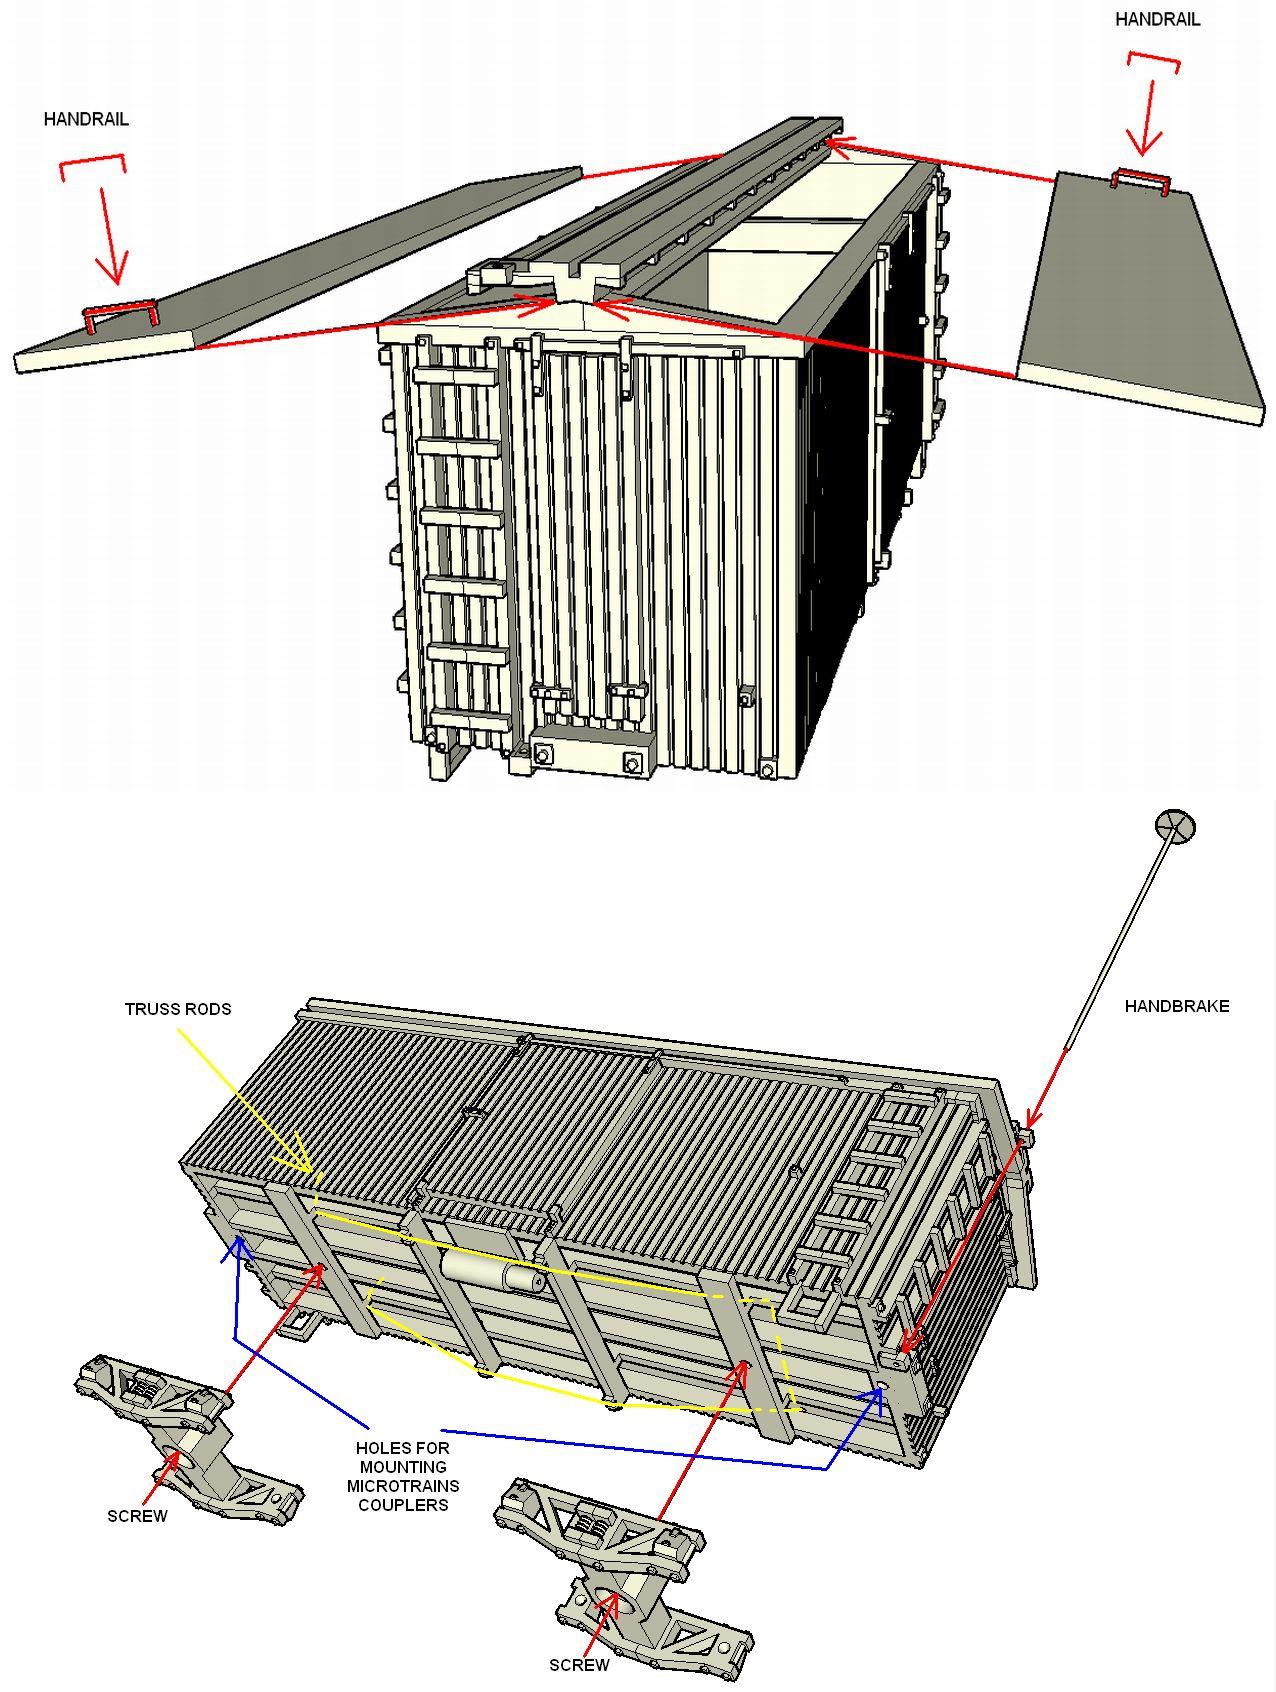 boxcar_instr_3.jpg